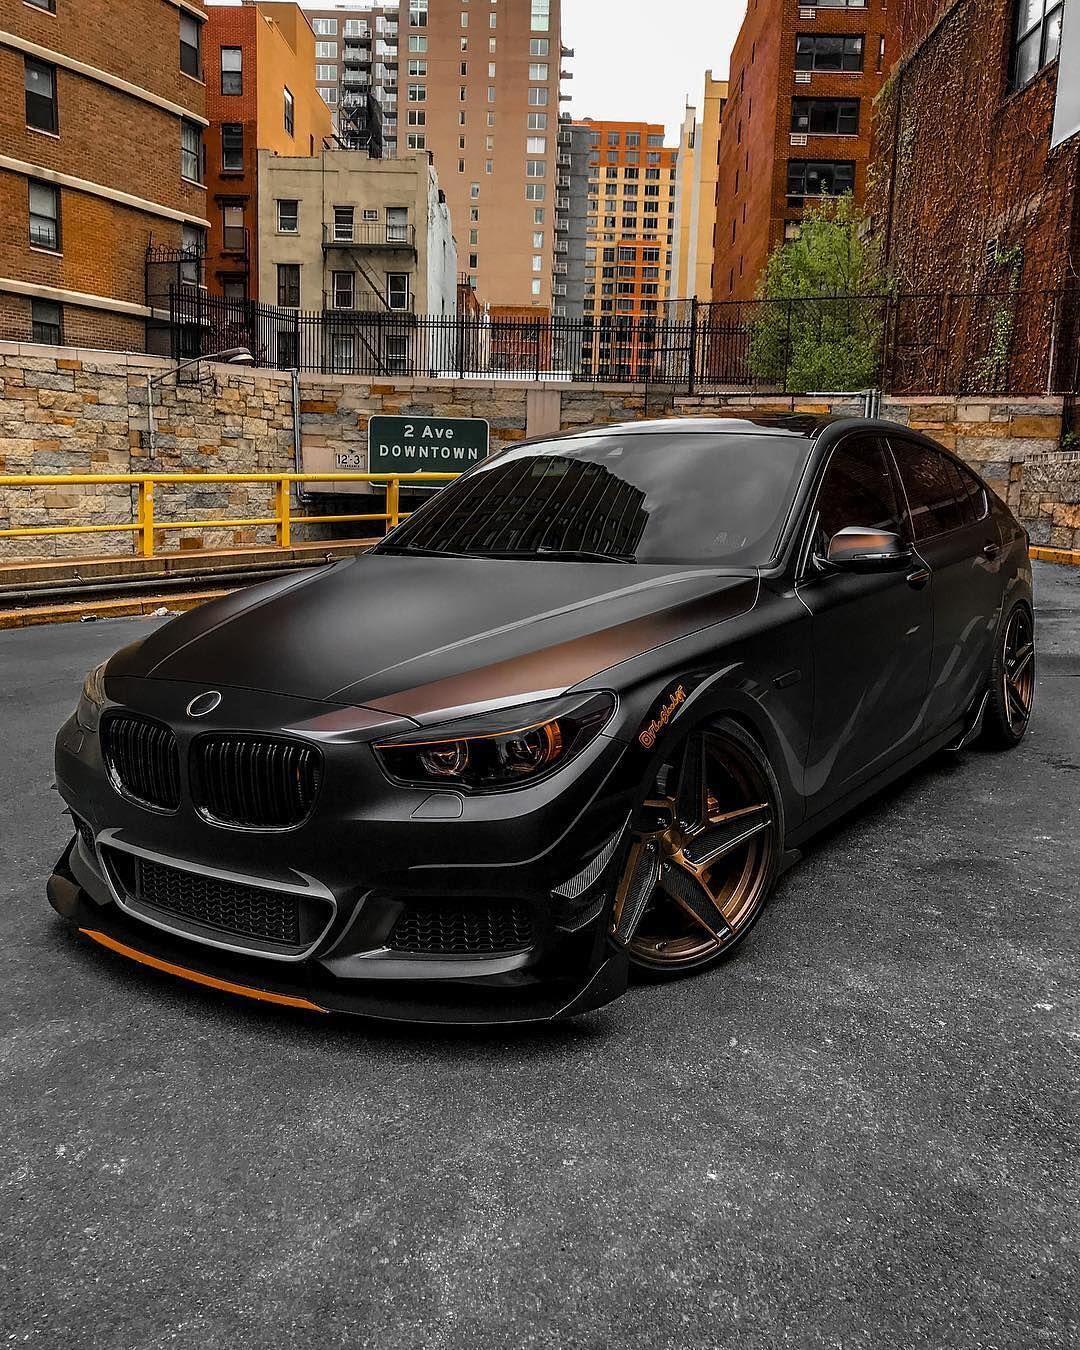 Bmw F07 5 Series Gt Black Bmw Bmw Black Top Luxury Cars